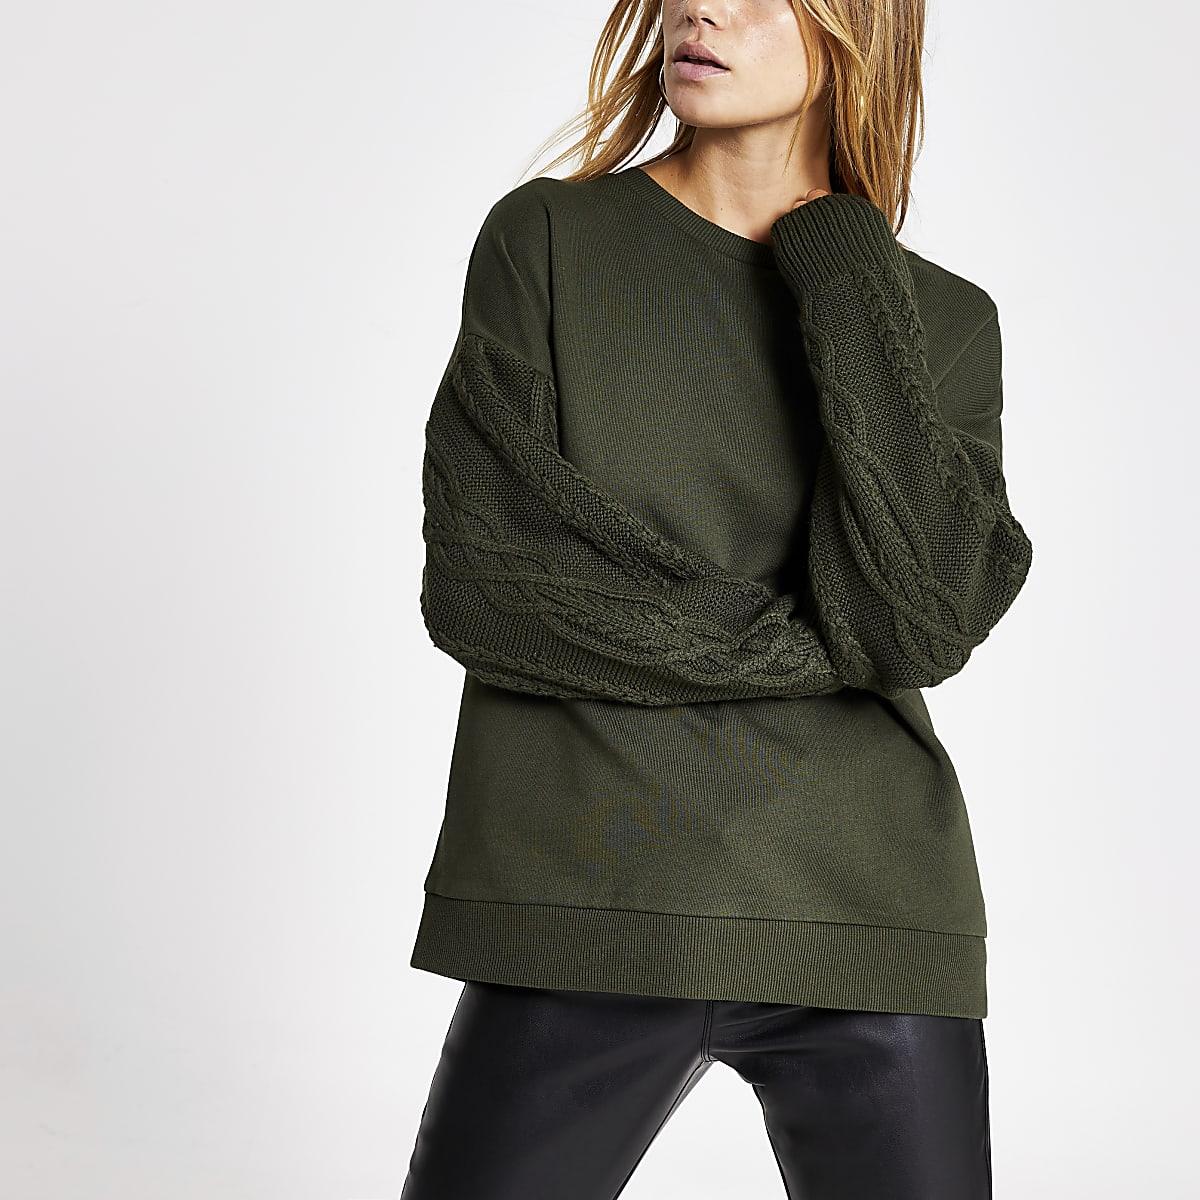 Khaki long cable knitted sleeve sweatshirt